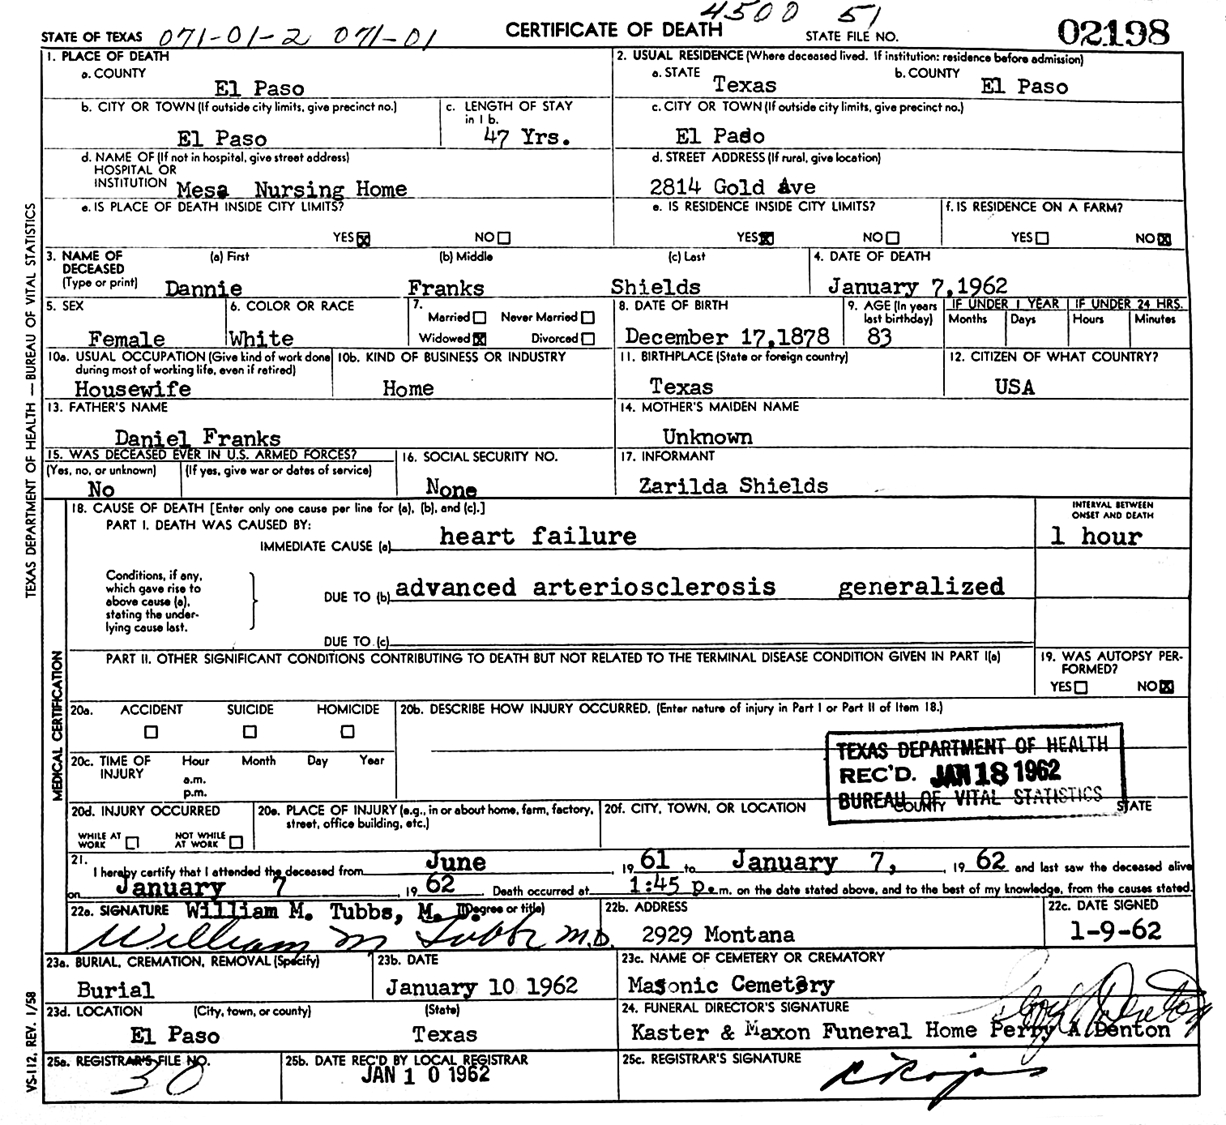 Daniel gandy franks dannie g franks shields death certificate aiddatafo Choice Image